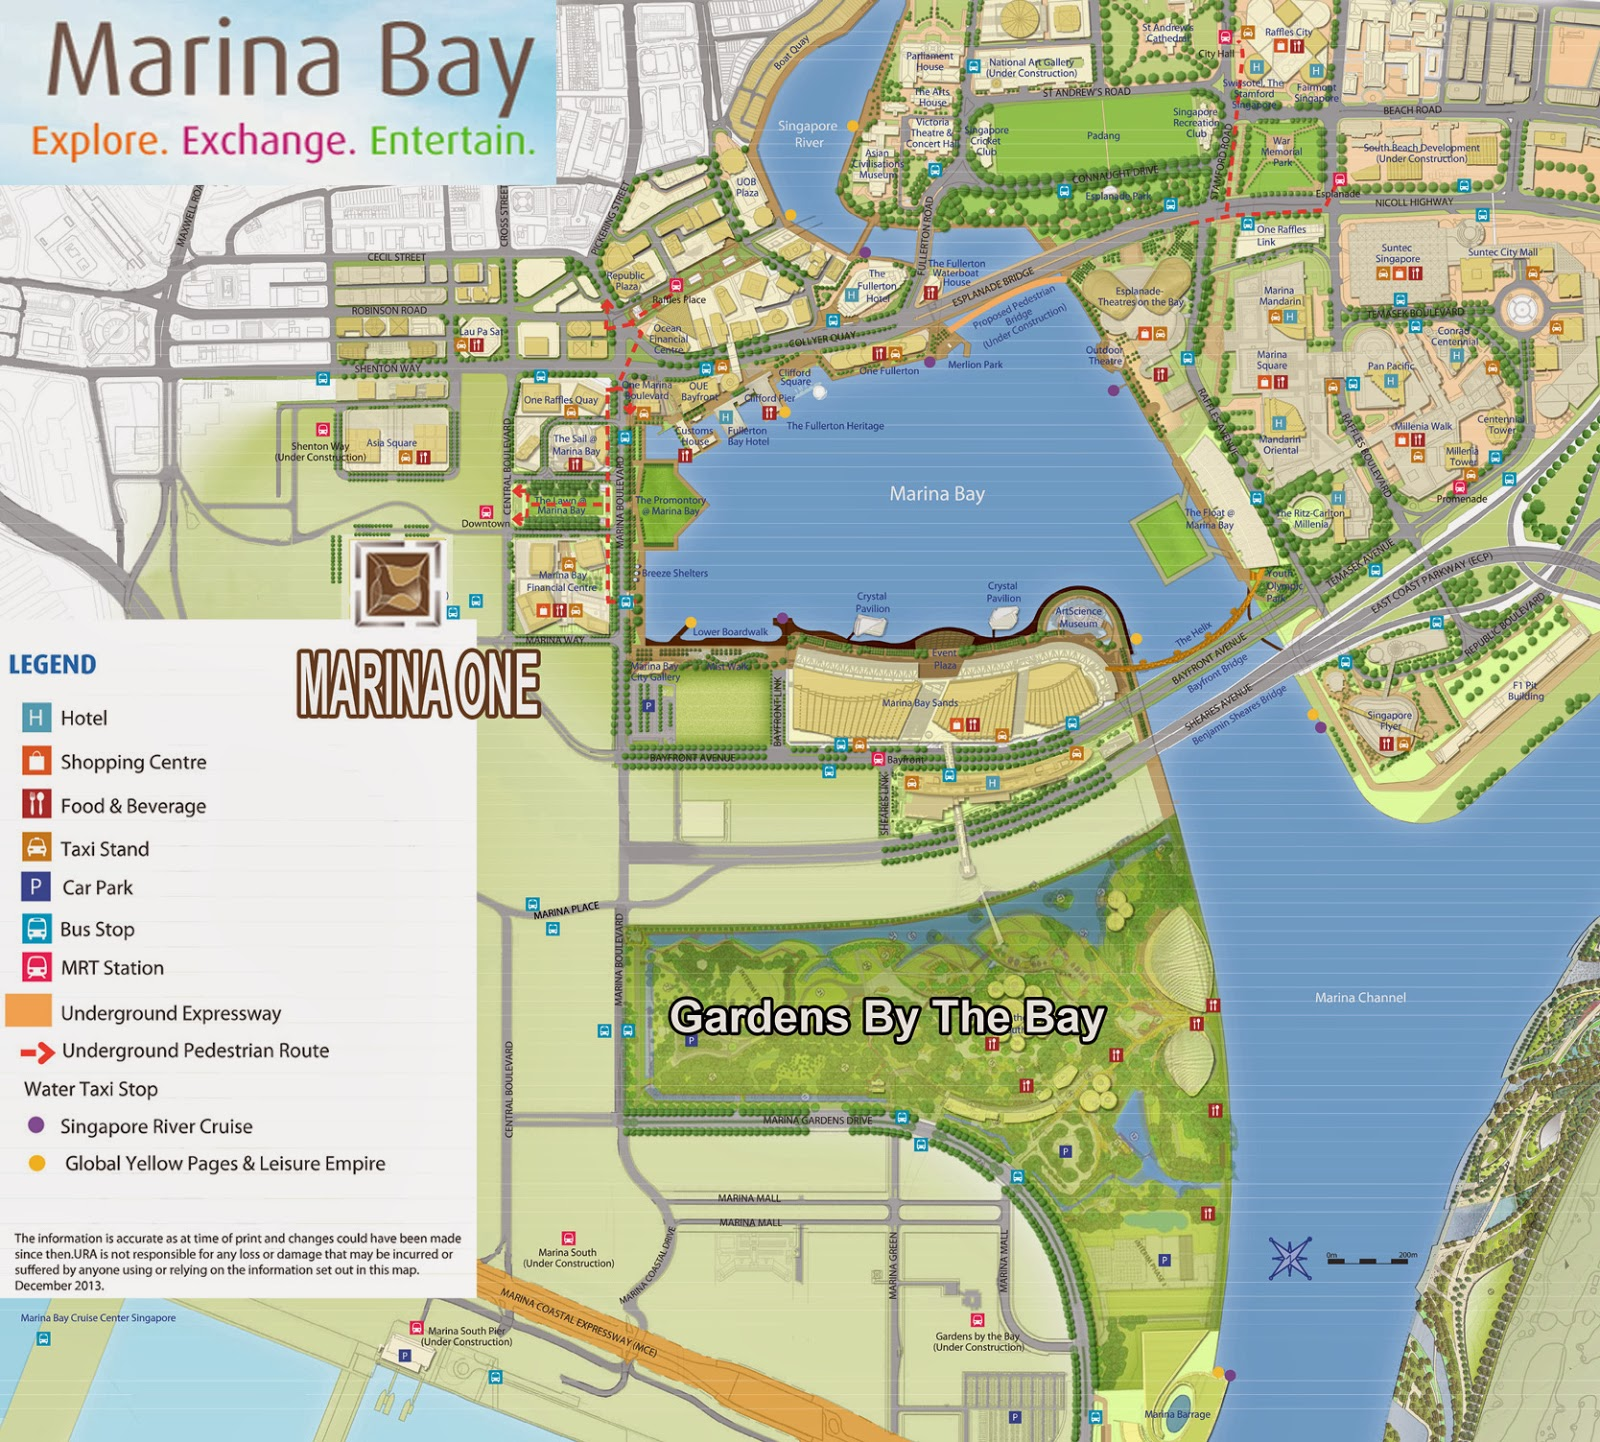 marina bay singapore - Garden By The Bay Mrt Station